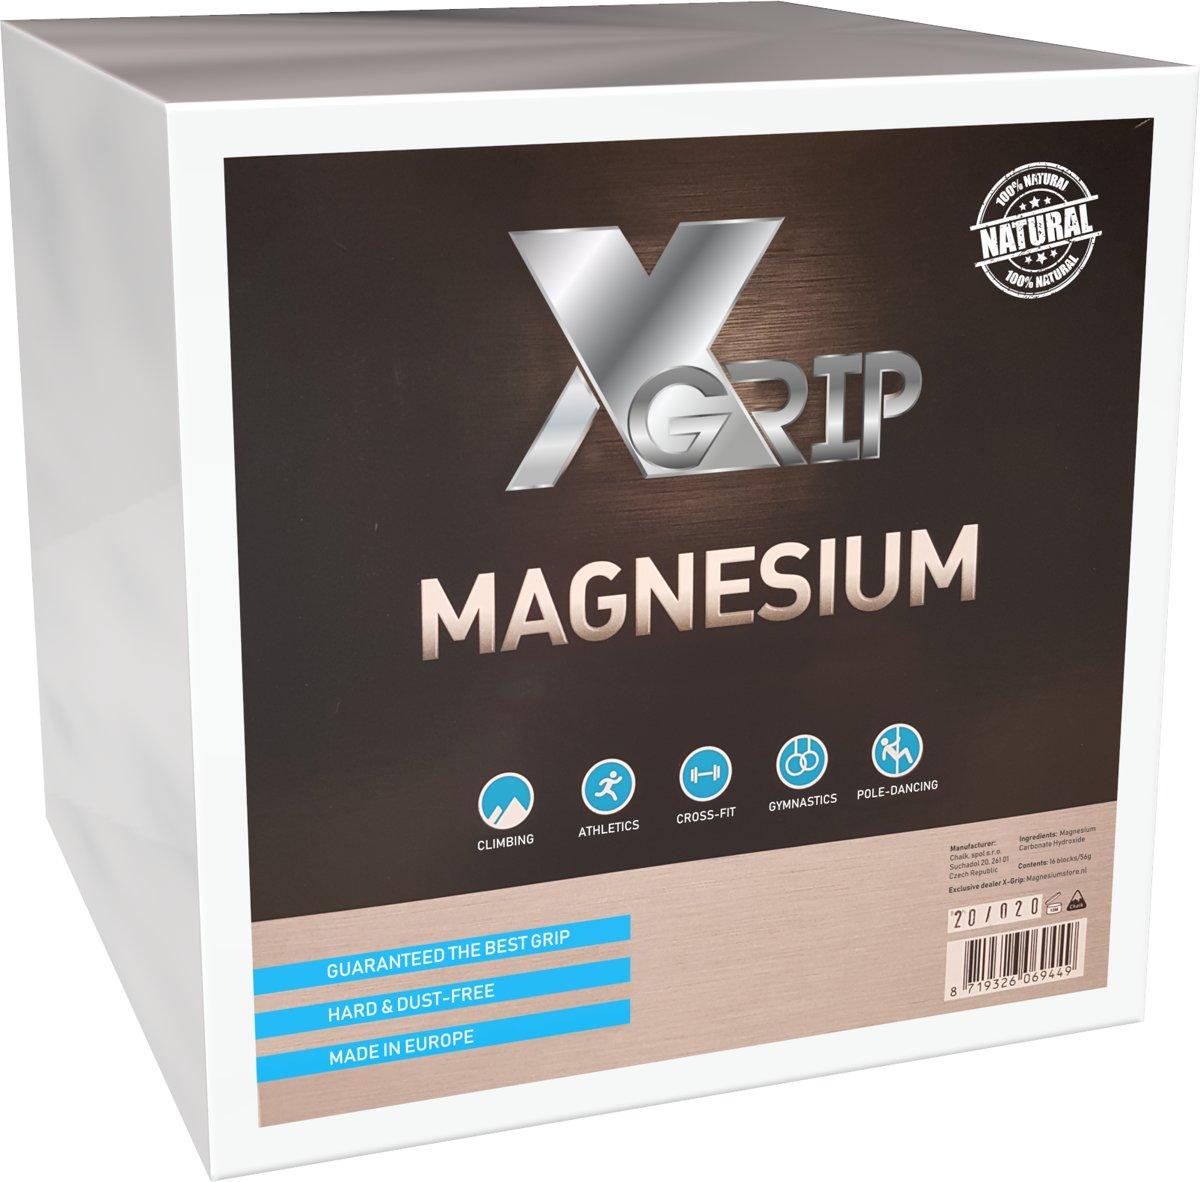 X-Grip Magnesium Bigbox  (16 Doosjes, 192 blokjes)  turnen,klimmen,fitness